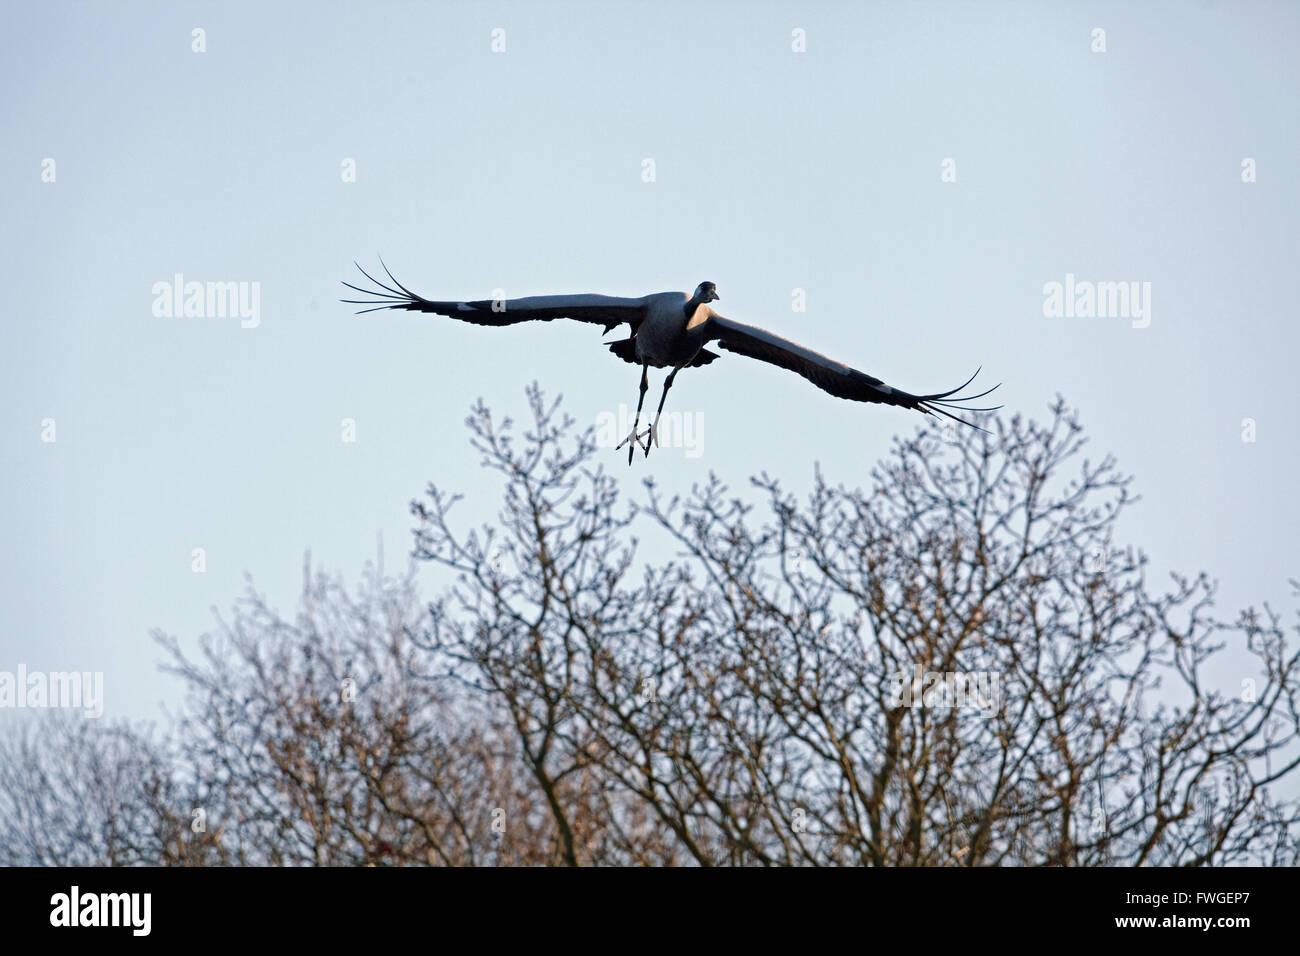 Common or Eurasian Crane (Grus grus).  Approaching flight. Negotiating tree tops. Broadland. Norfolk. UK. Stock Photo